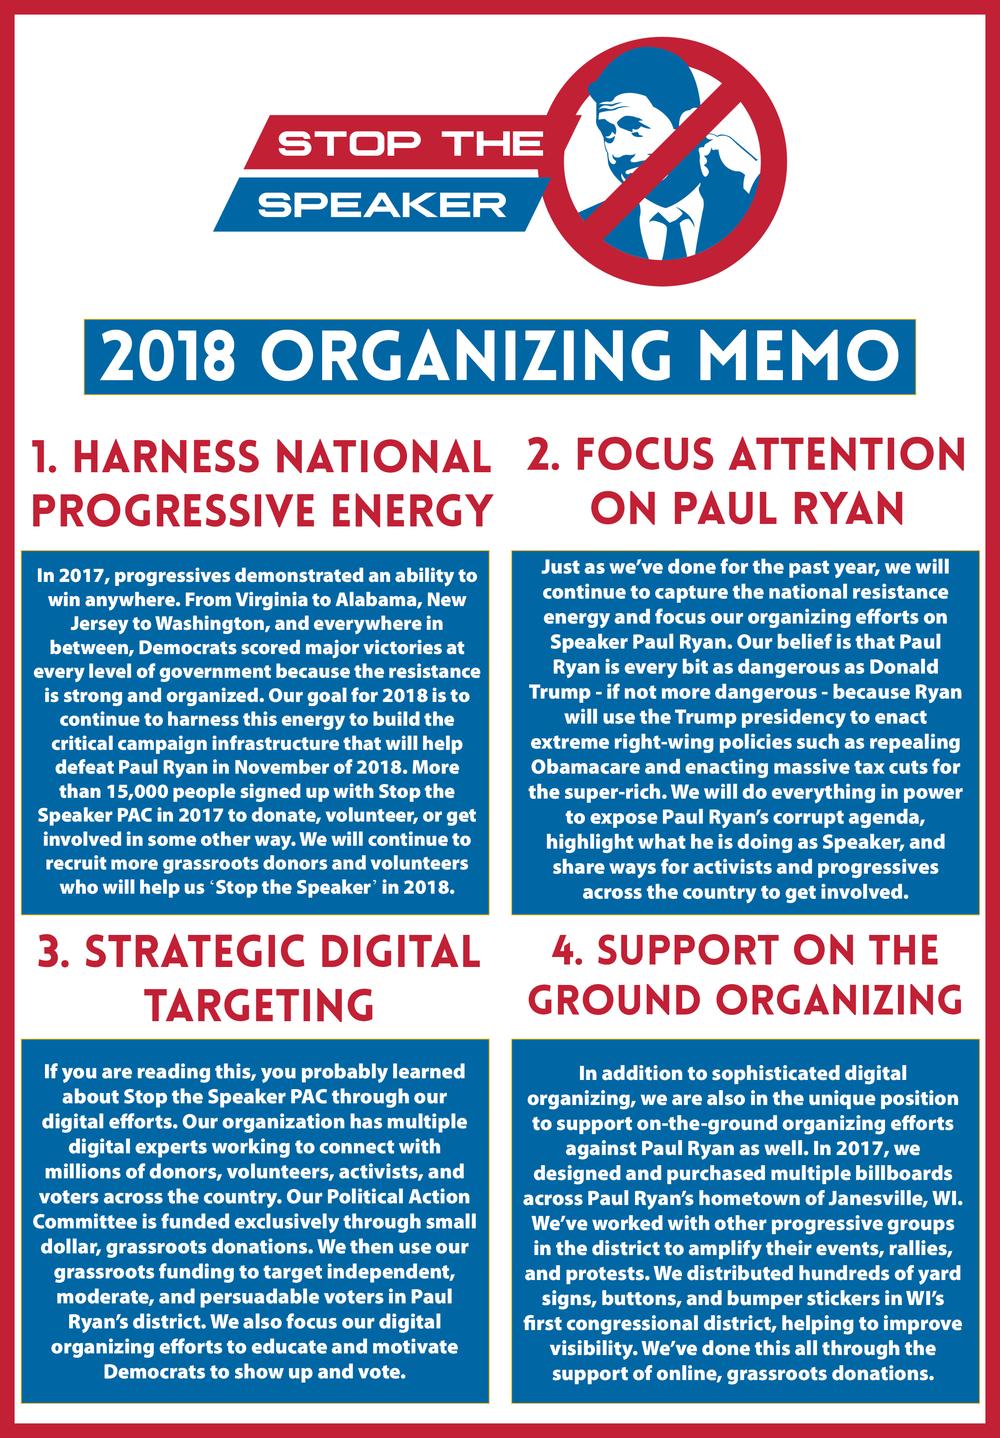 2018 organizing memo.png